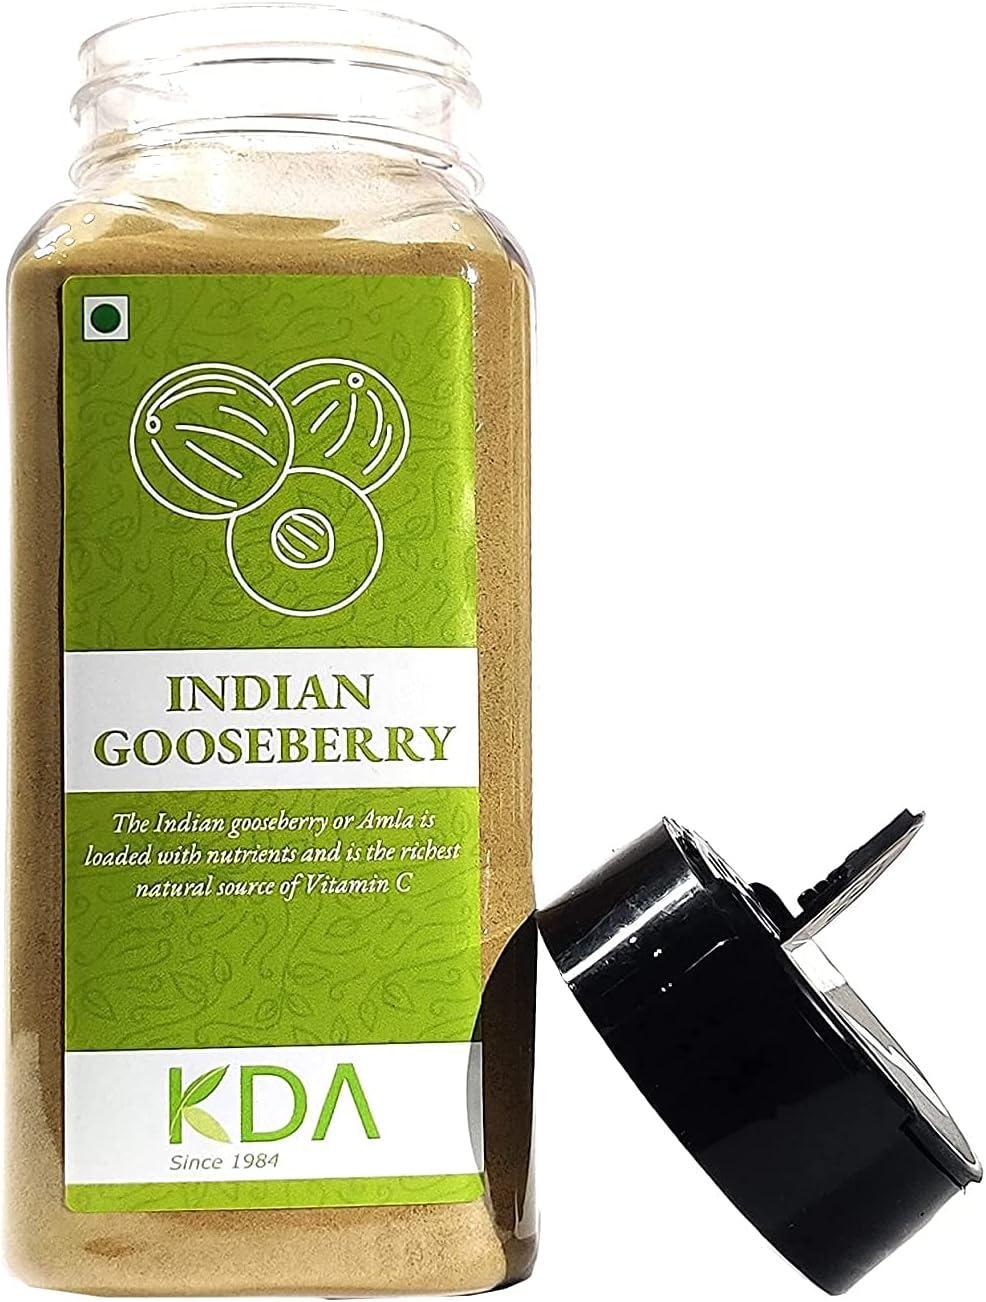 Gannon KDA Indian Gooseberry latest 180g Max 61% OFF Powder Amla